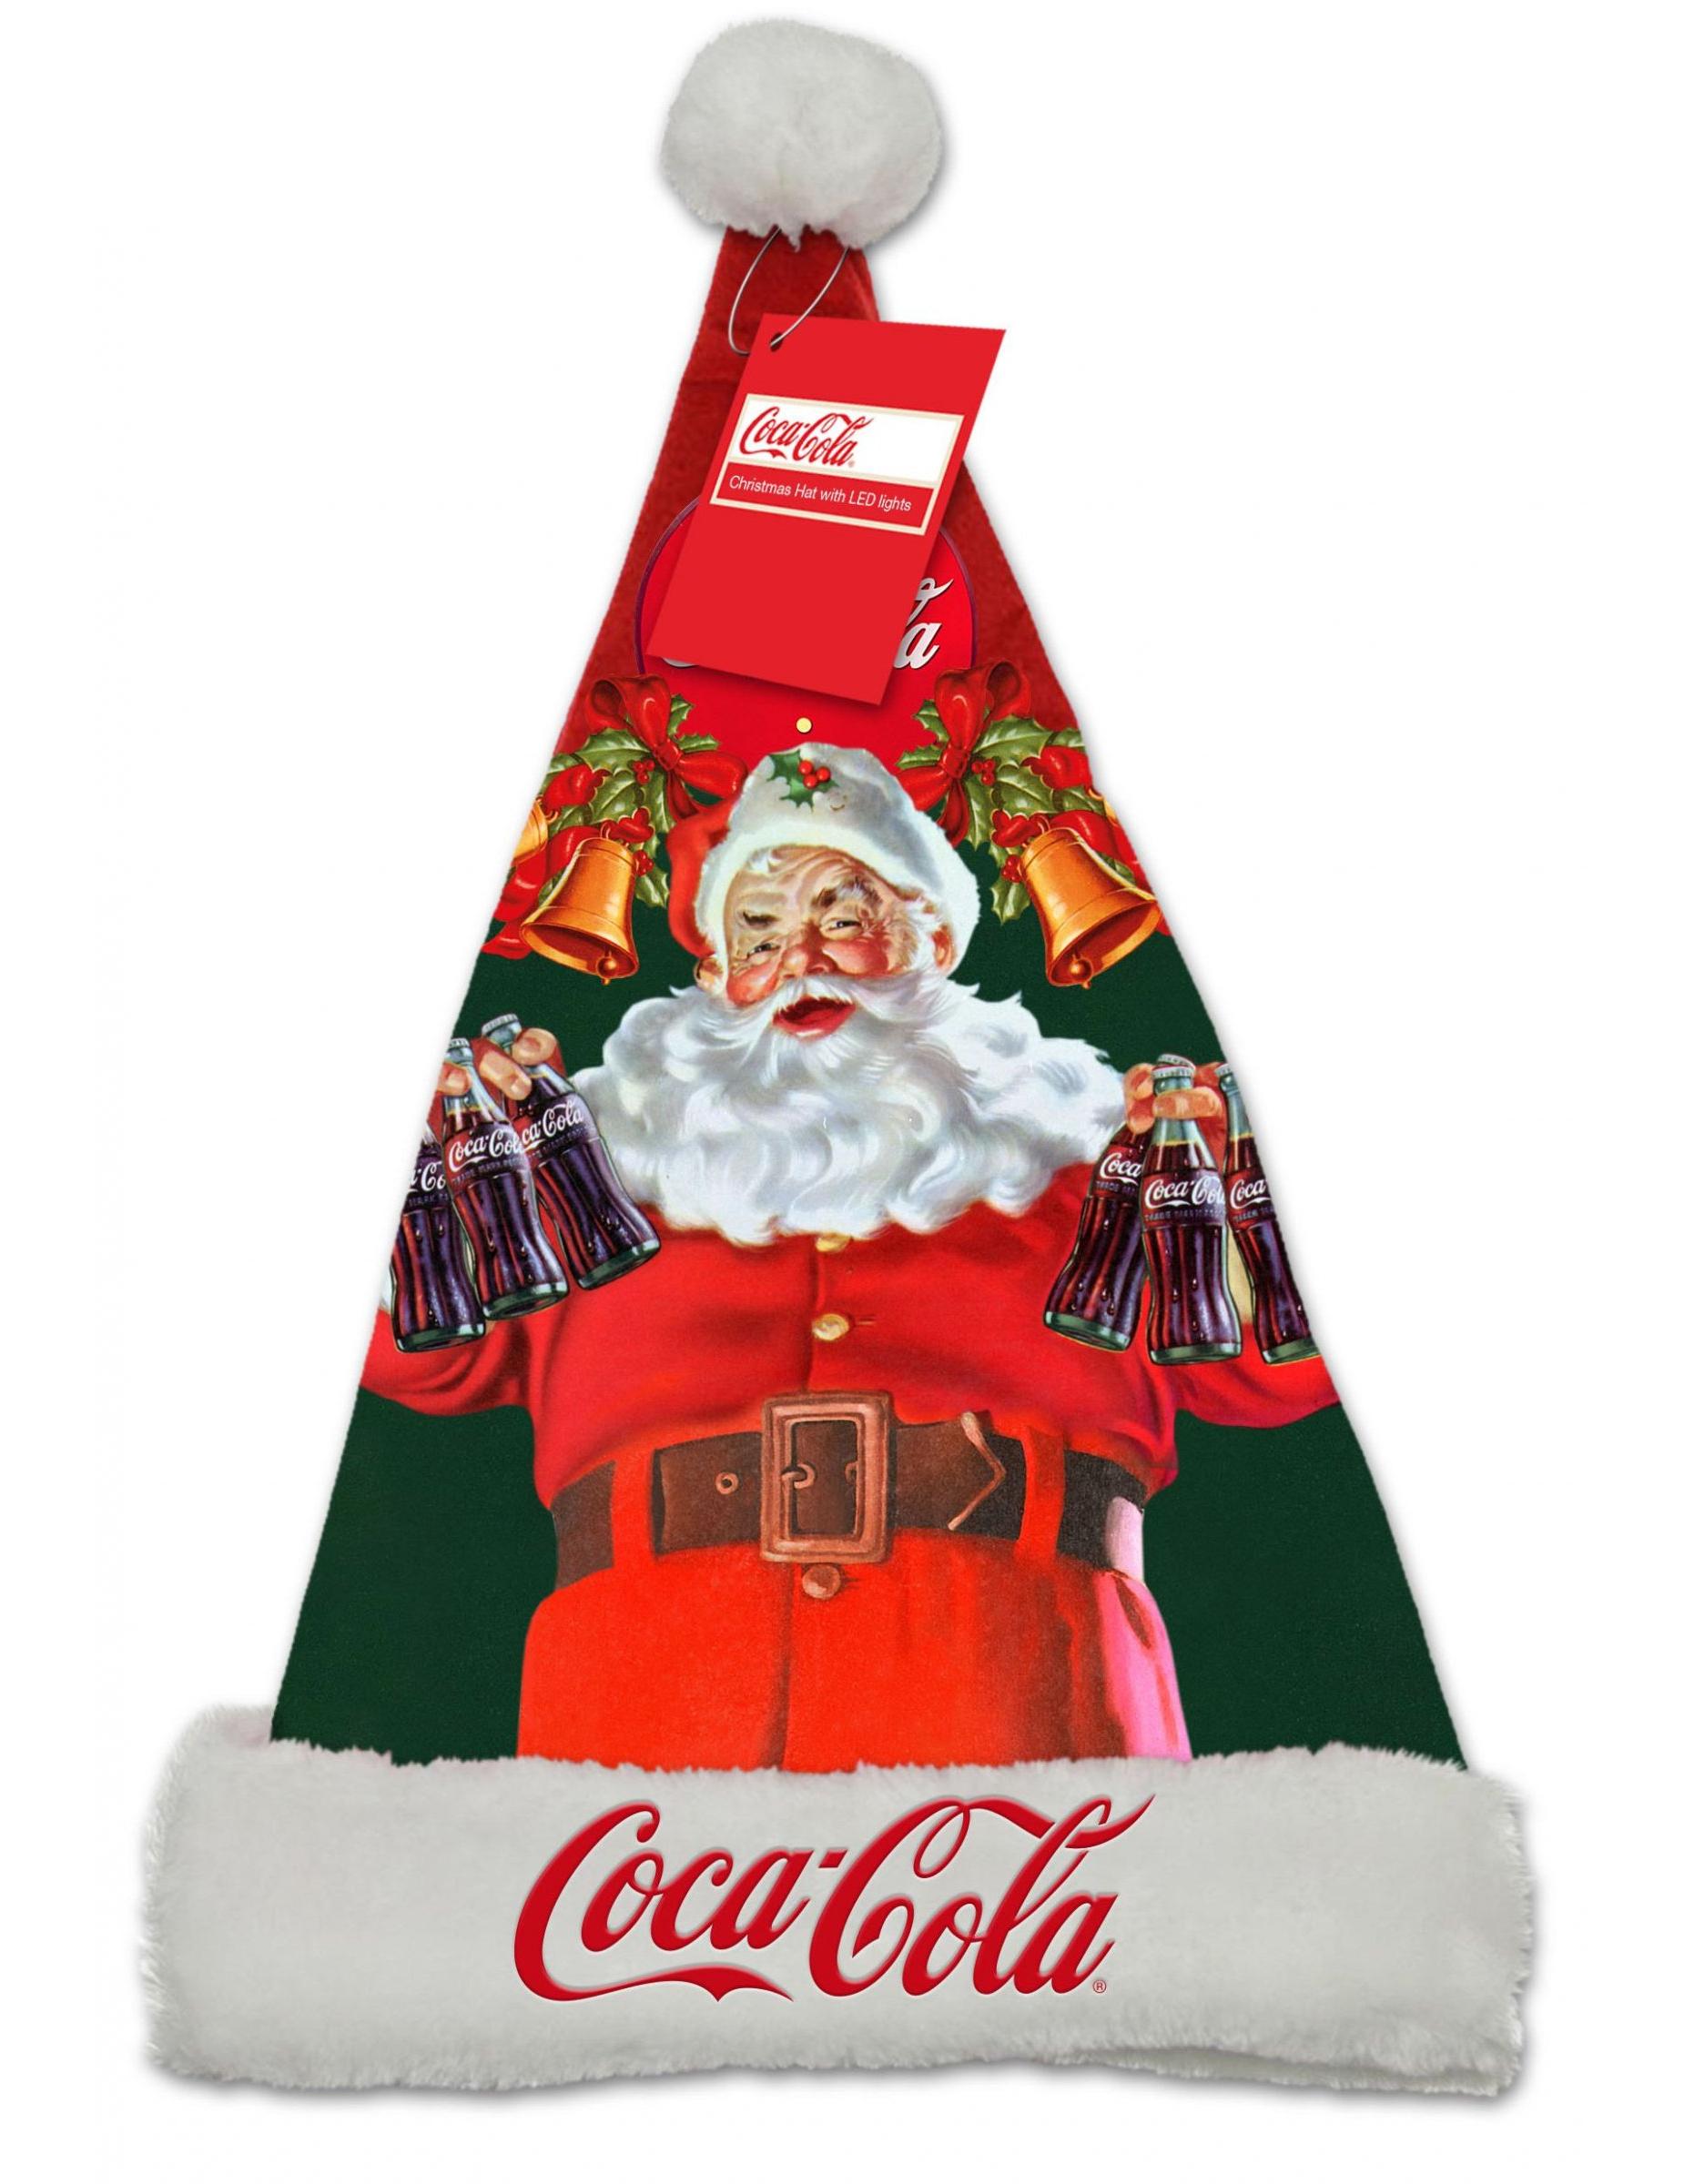 beleuchtete weihnachtsmann m tze coca cola bunt h te. Black Bedroom Furniture Sets. Home Design Ideas